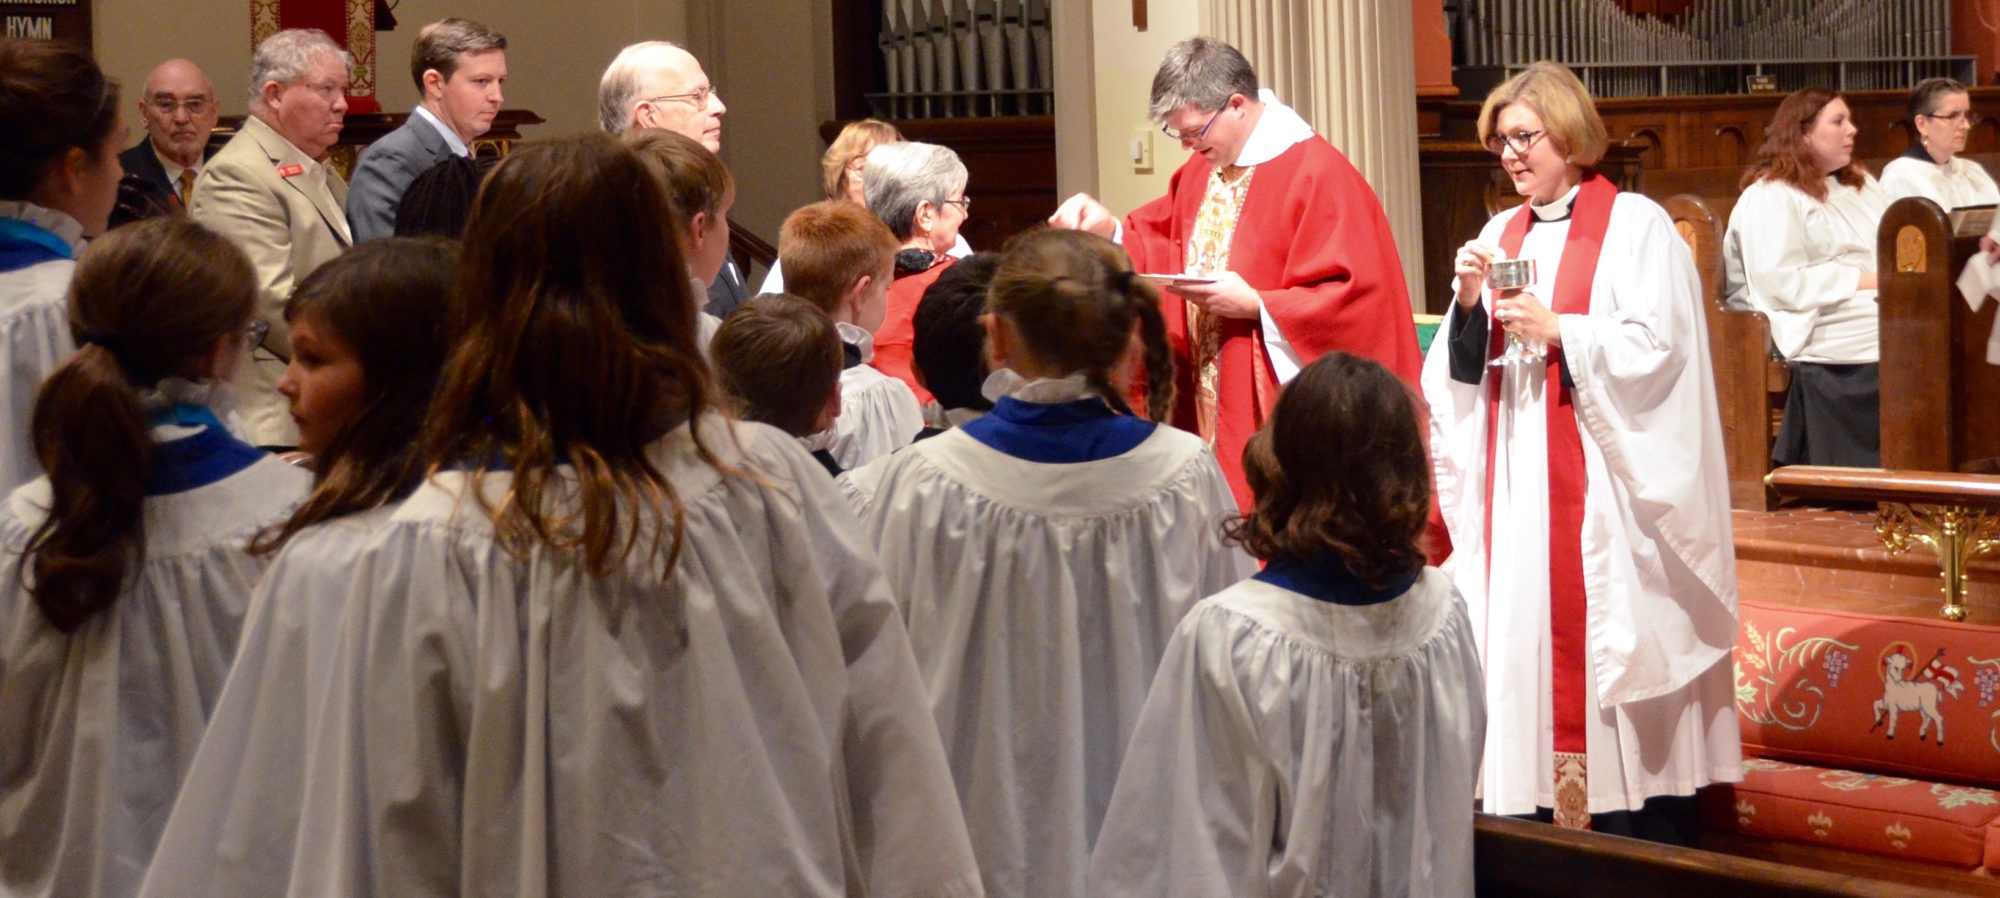 Receiving communion photo - faith